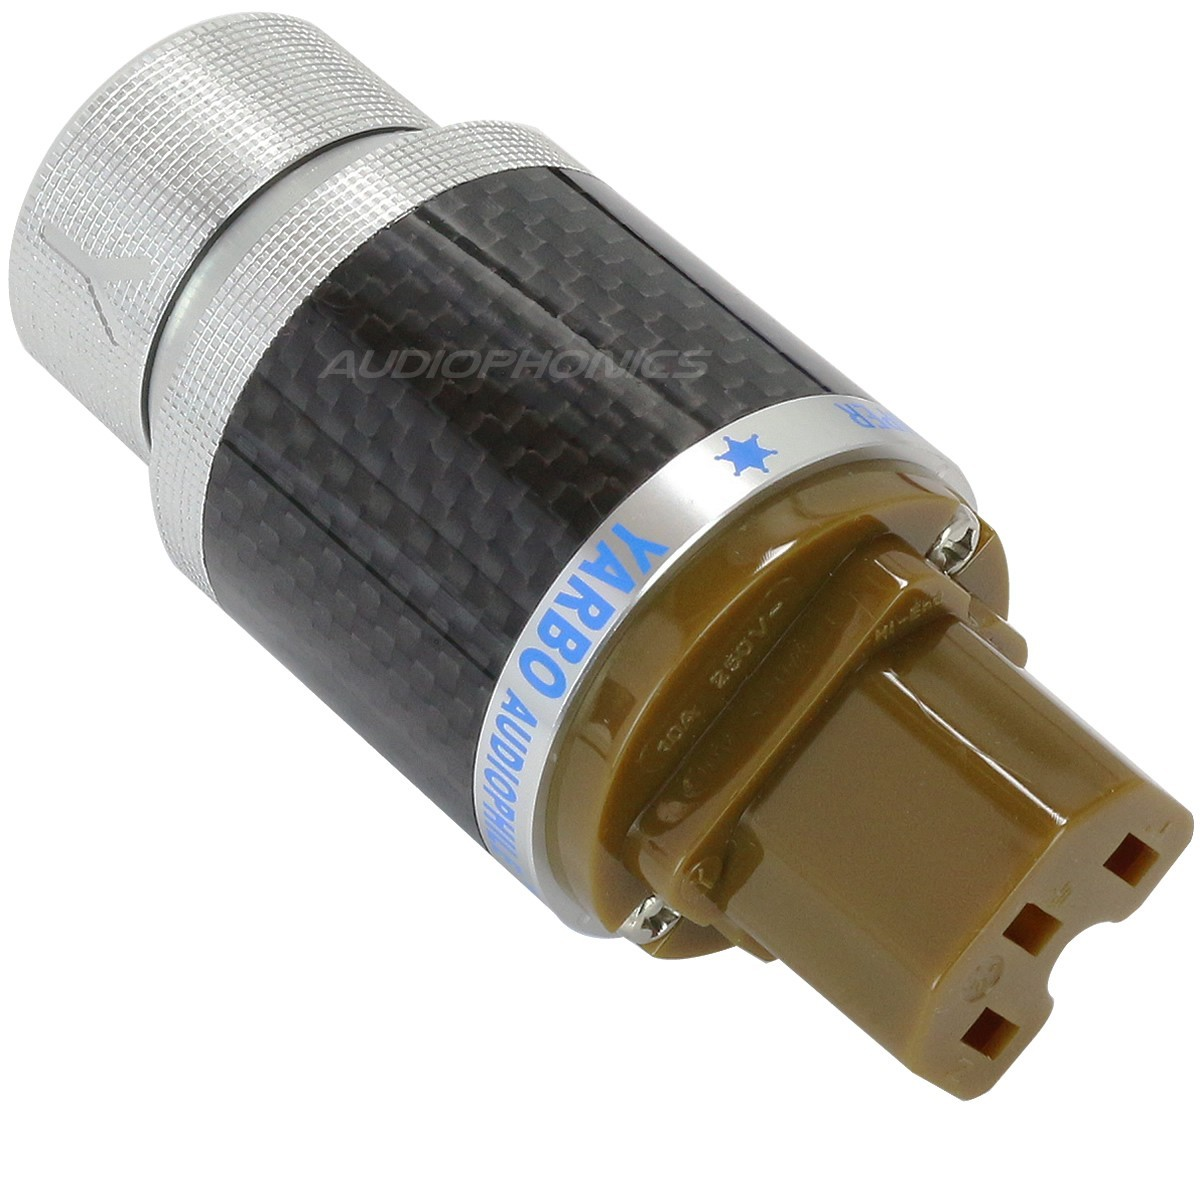 YARBO GY-910CF-R Connecteur secteur IEC Rhodium plated Ø 15mm